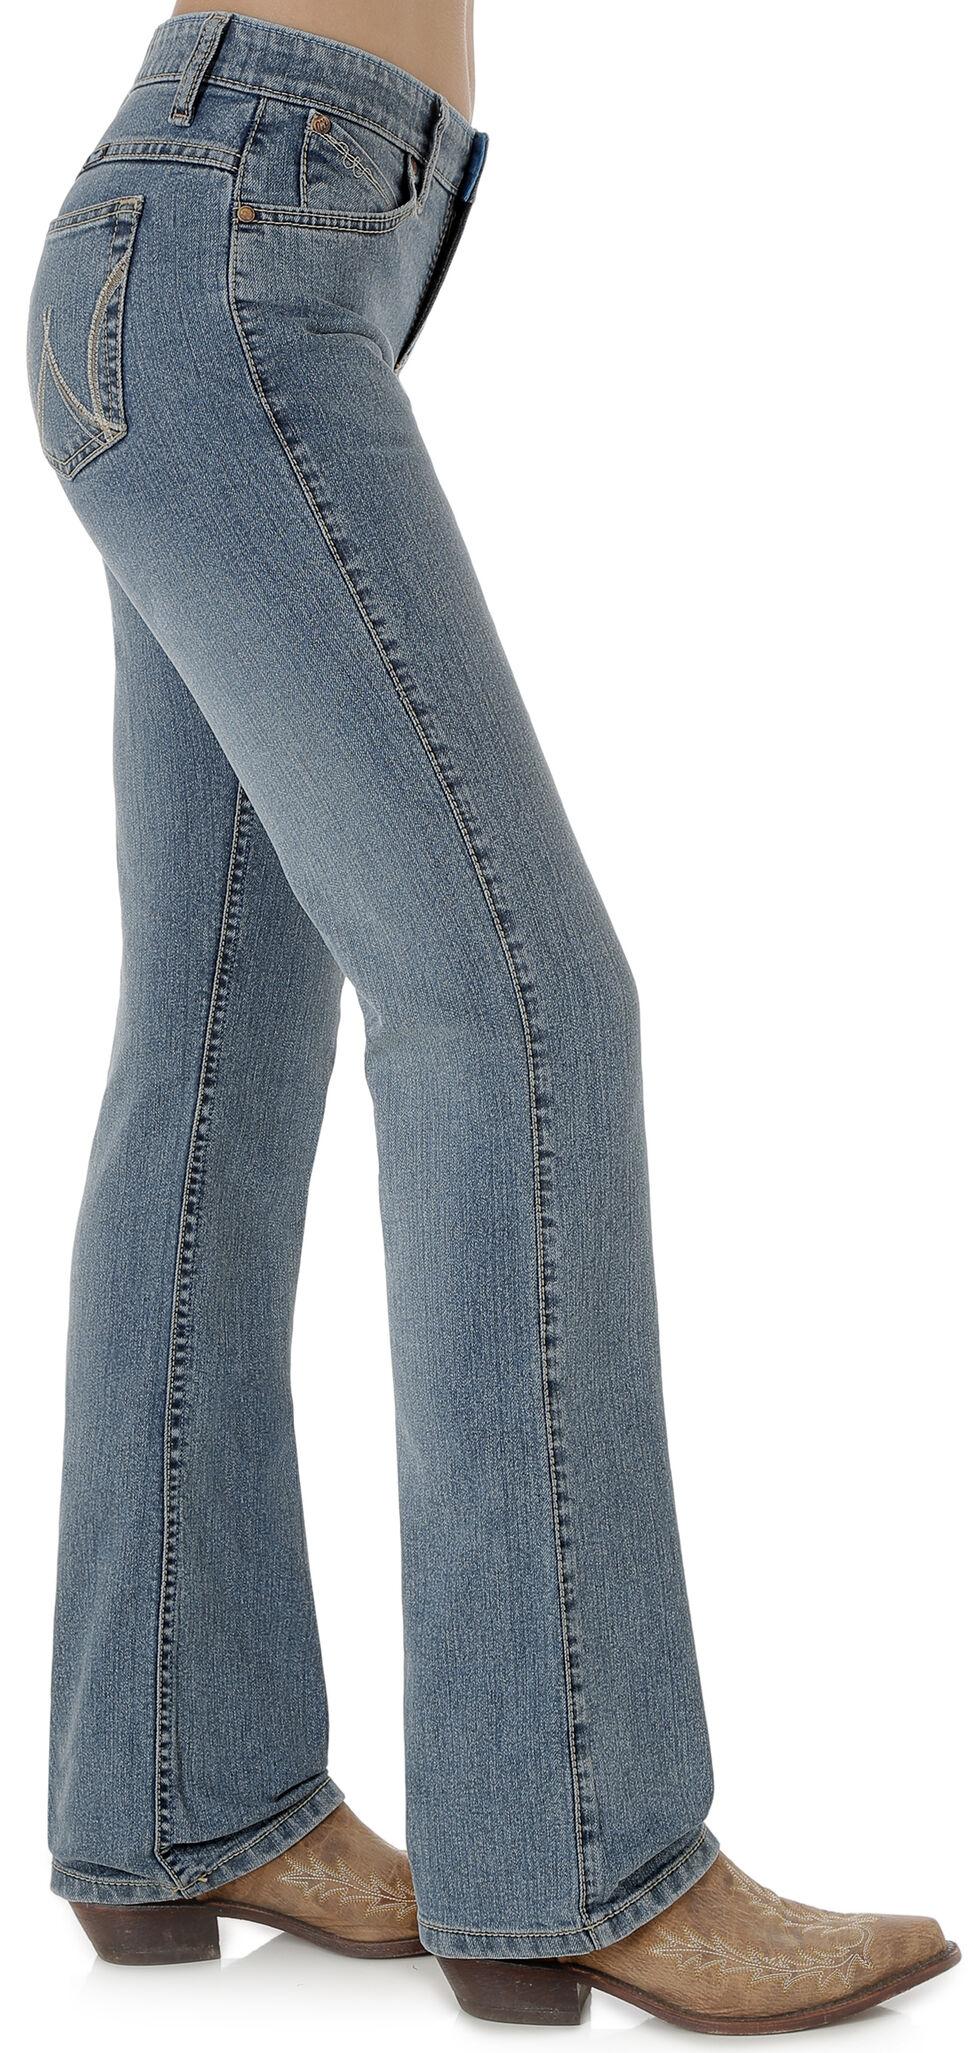 Wrangler Women's Cool Vantage Ultimate Riding Q-Baby Jeans, Indigo, hi-res